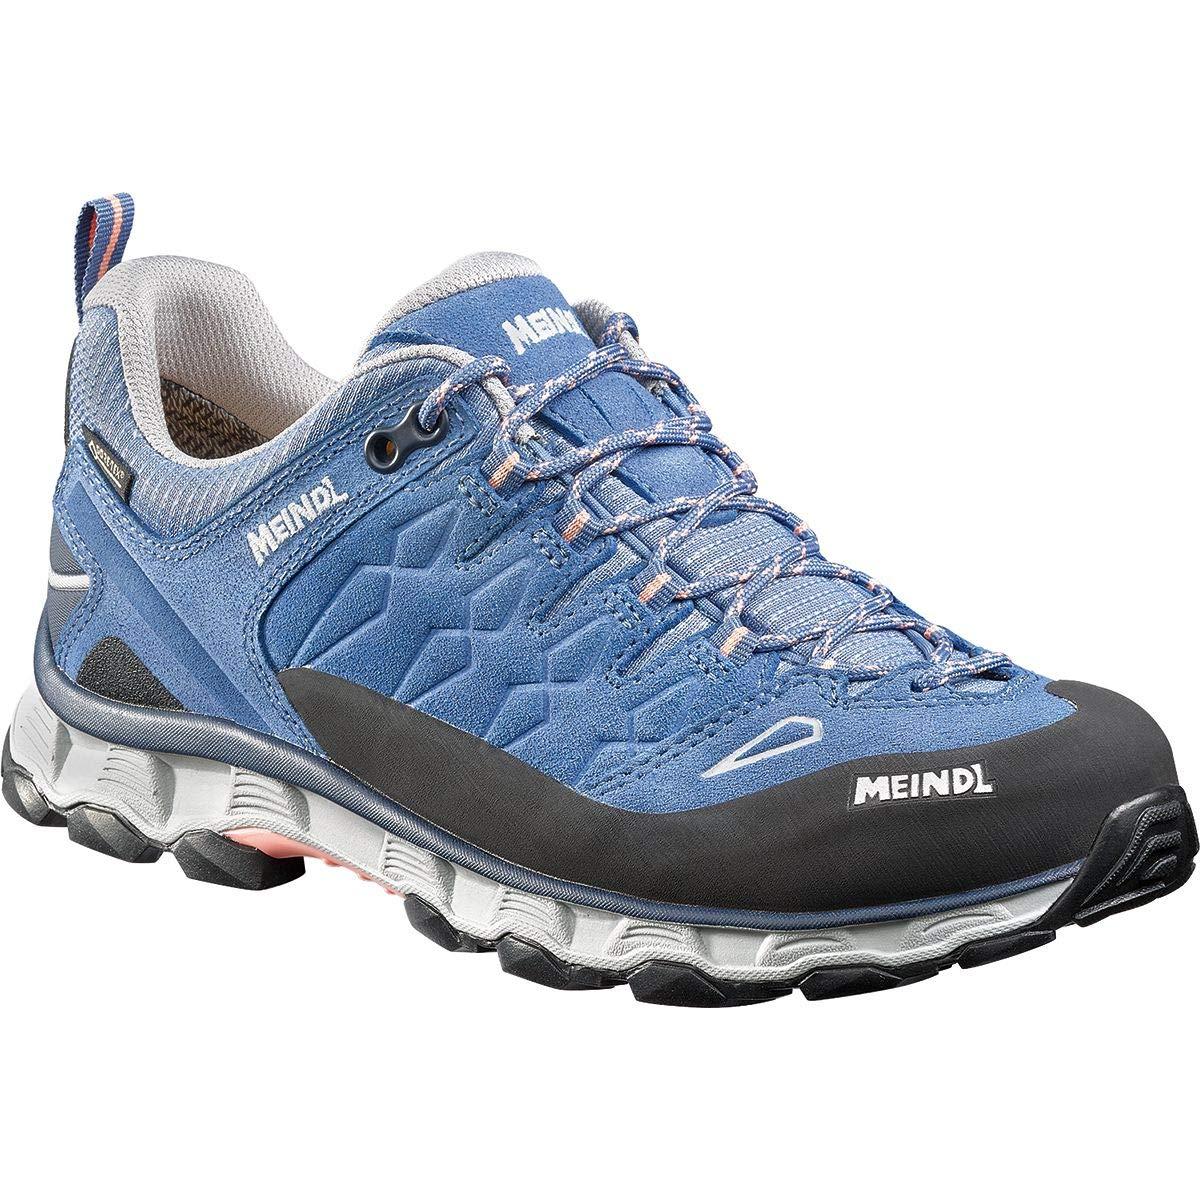 Meindl Damen Damen Damen lite Trail GTX Schuhe 0e35ec